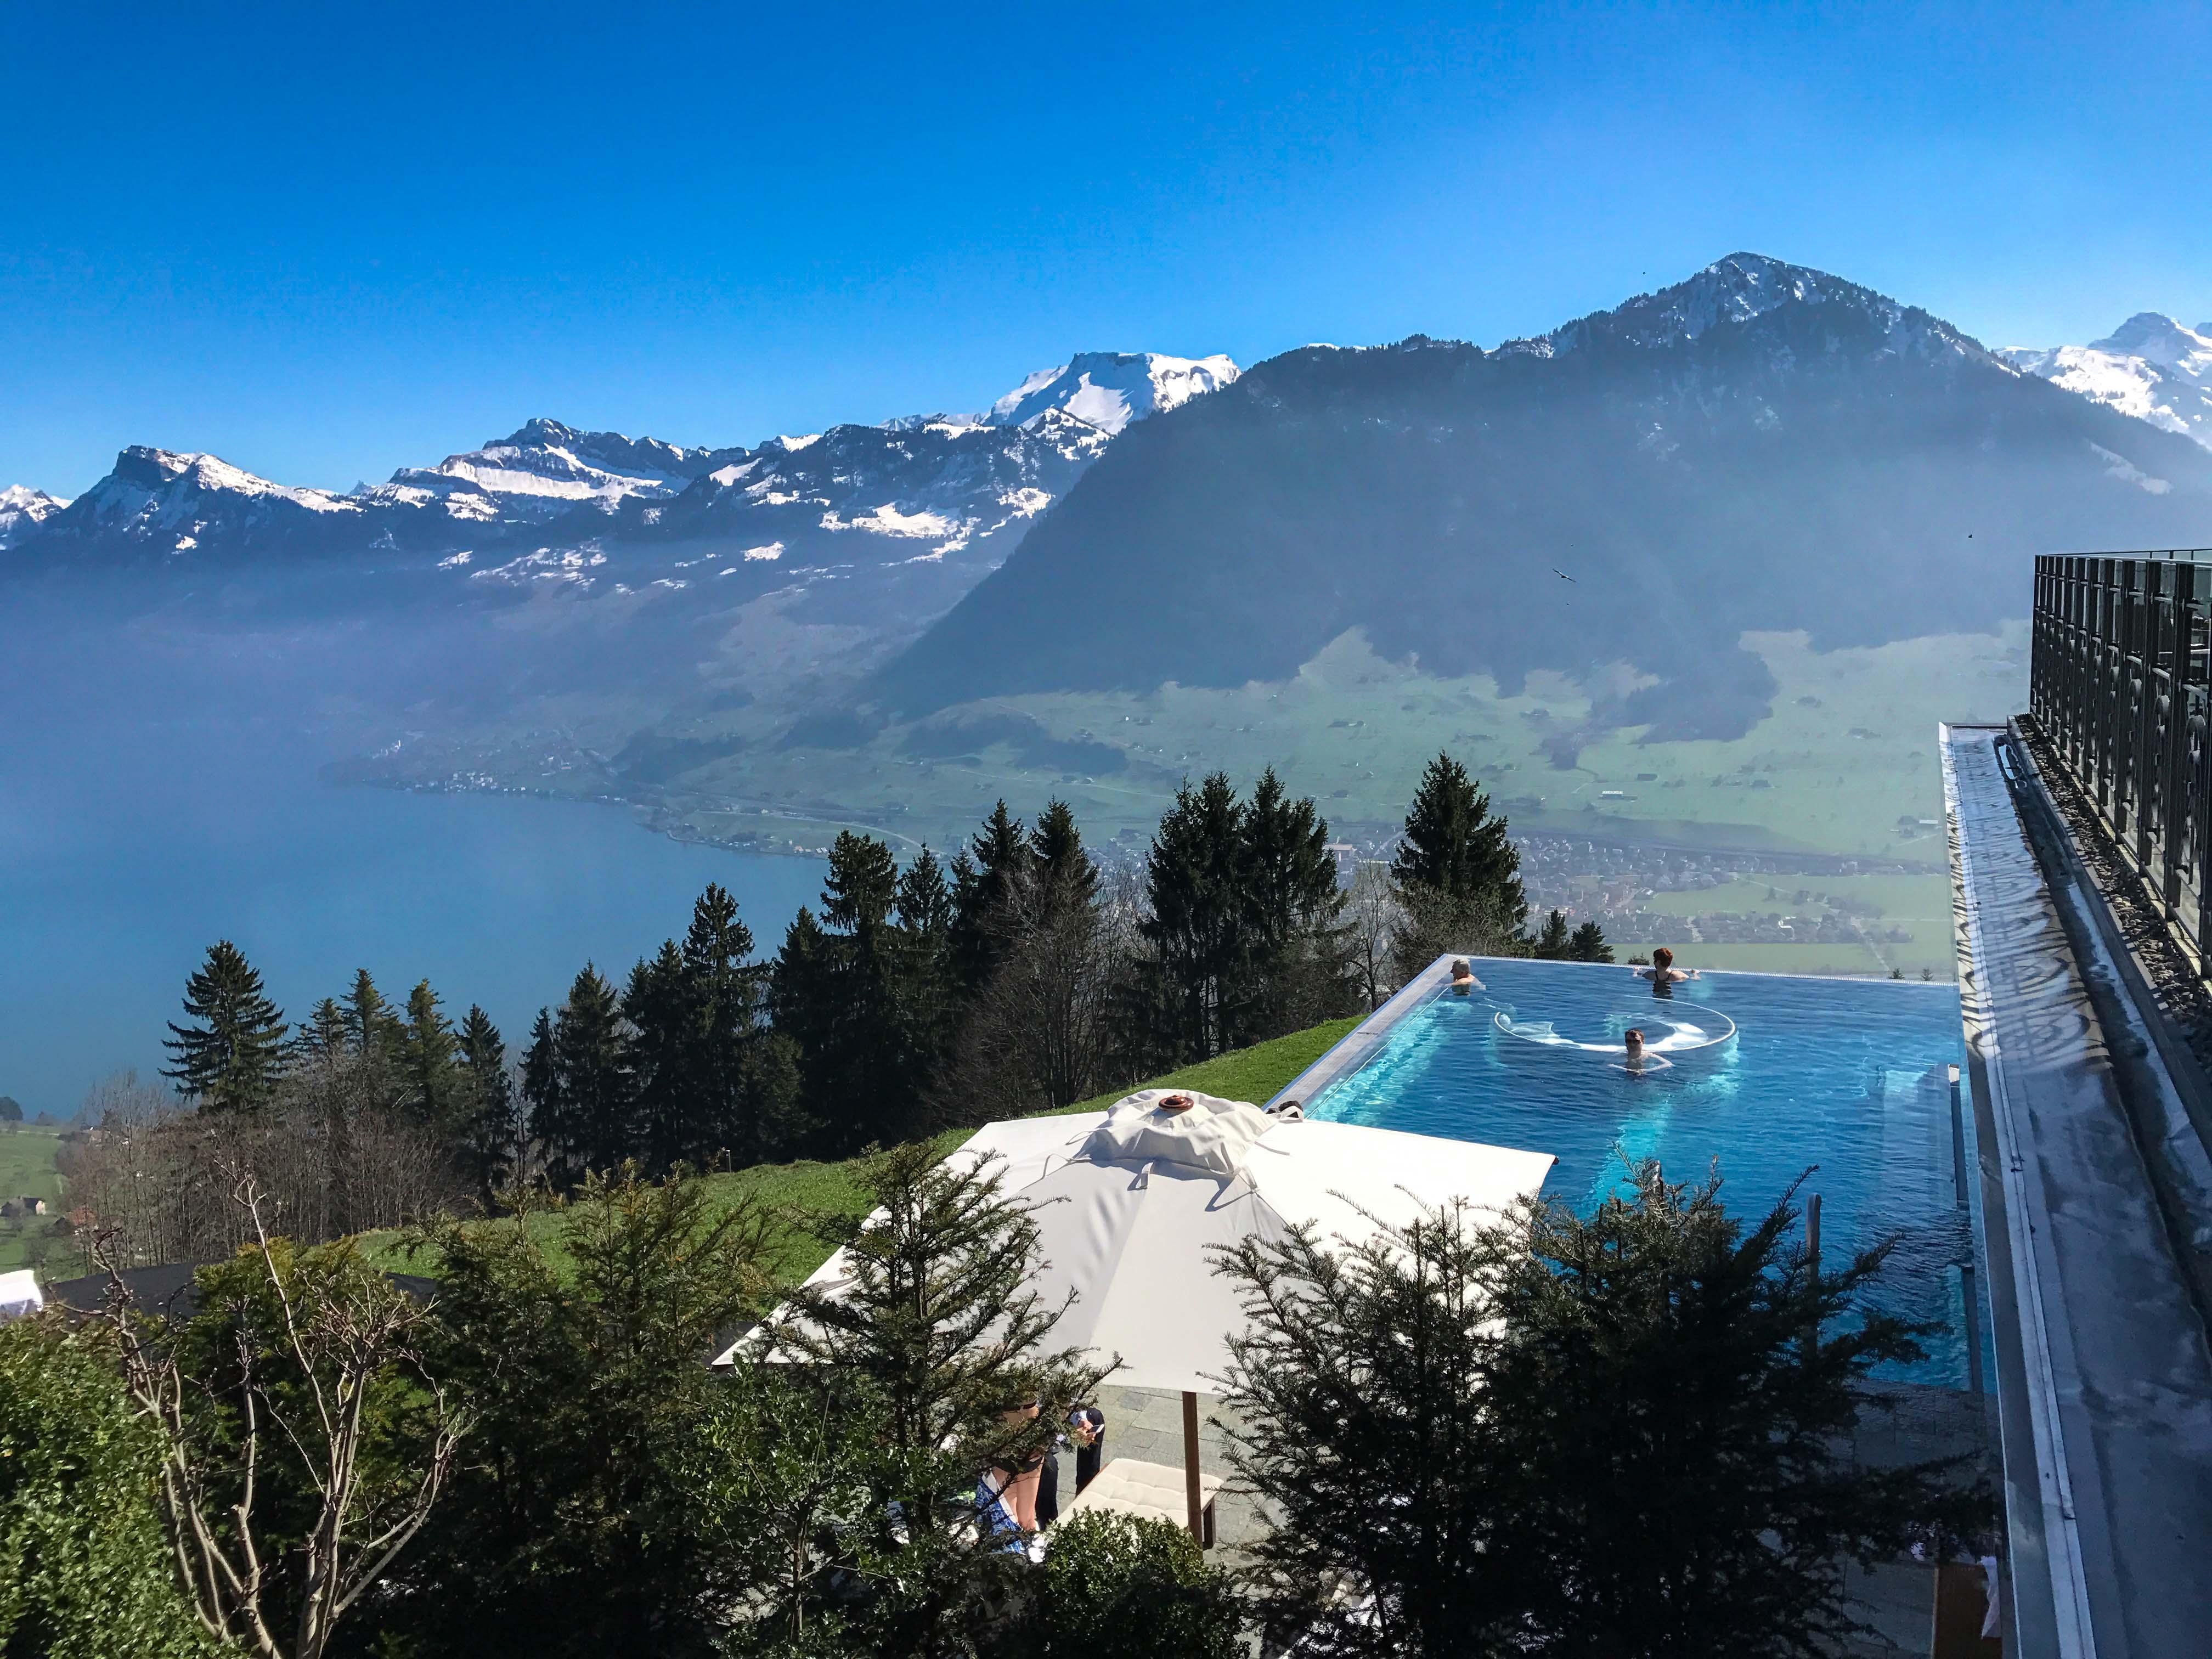 foto da piscina e vista do hotel villa honegg - lucerna